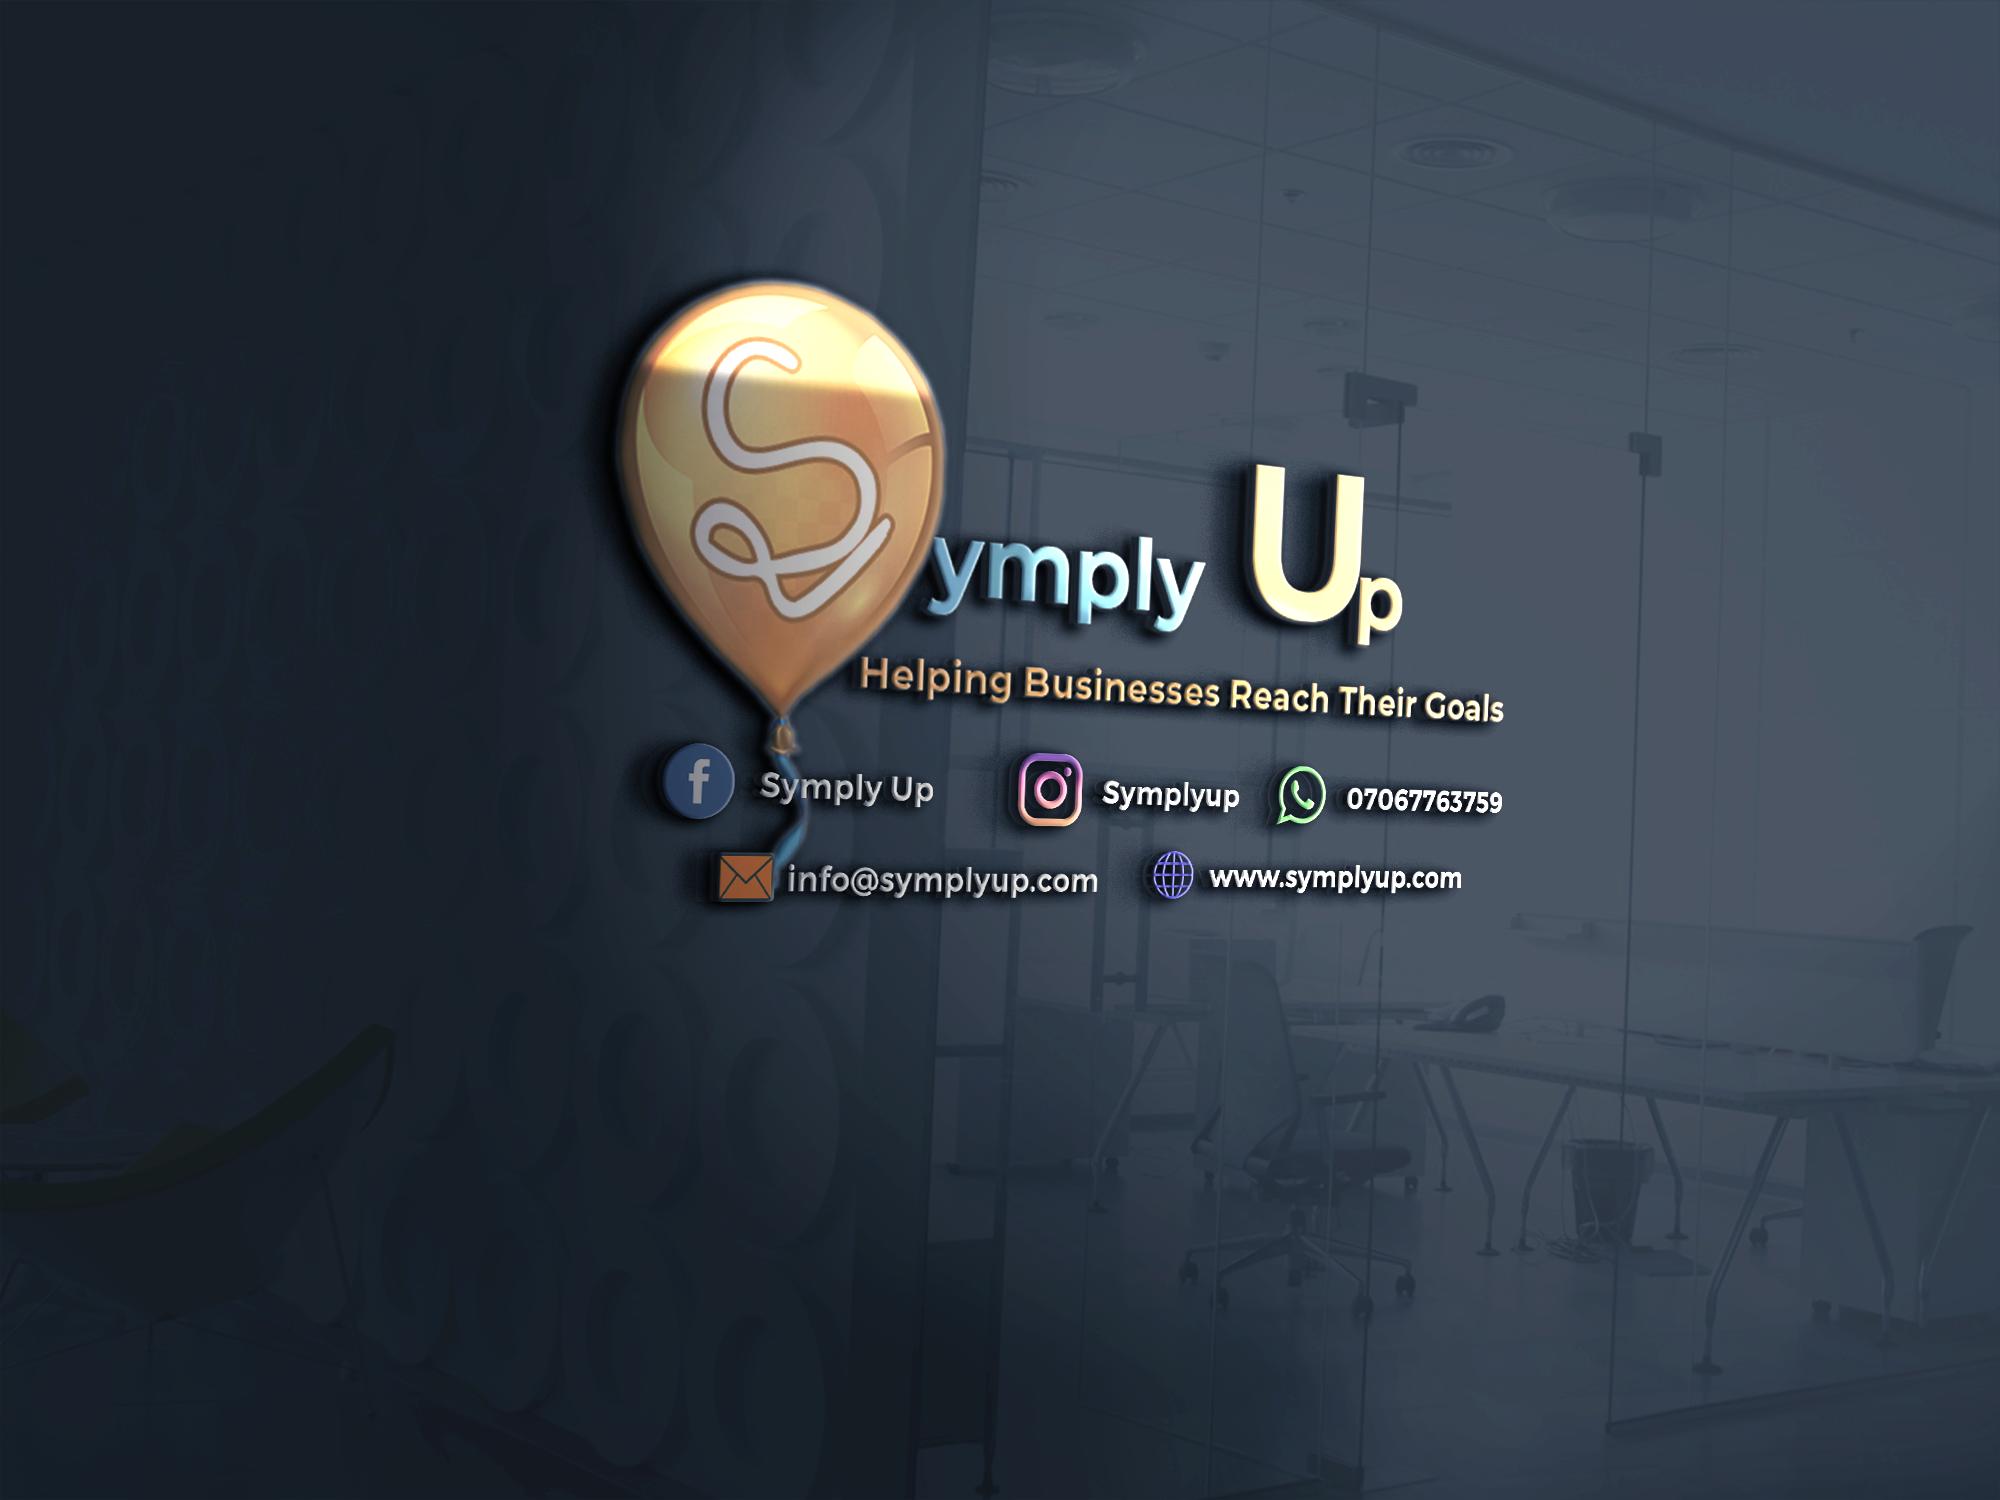 Symply Up logo